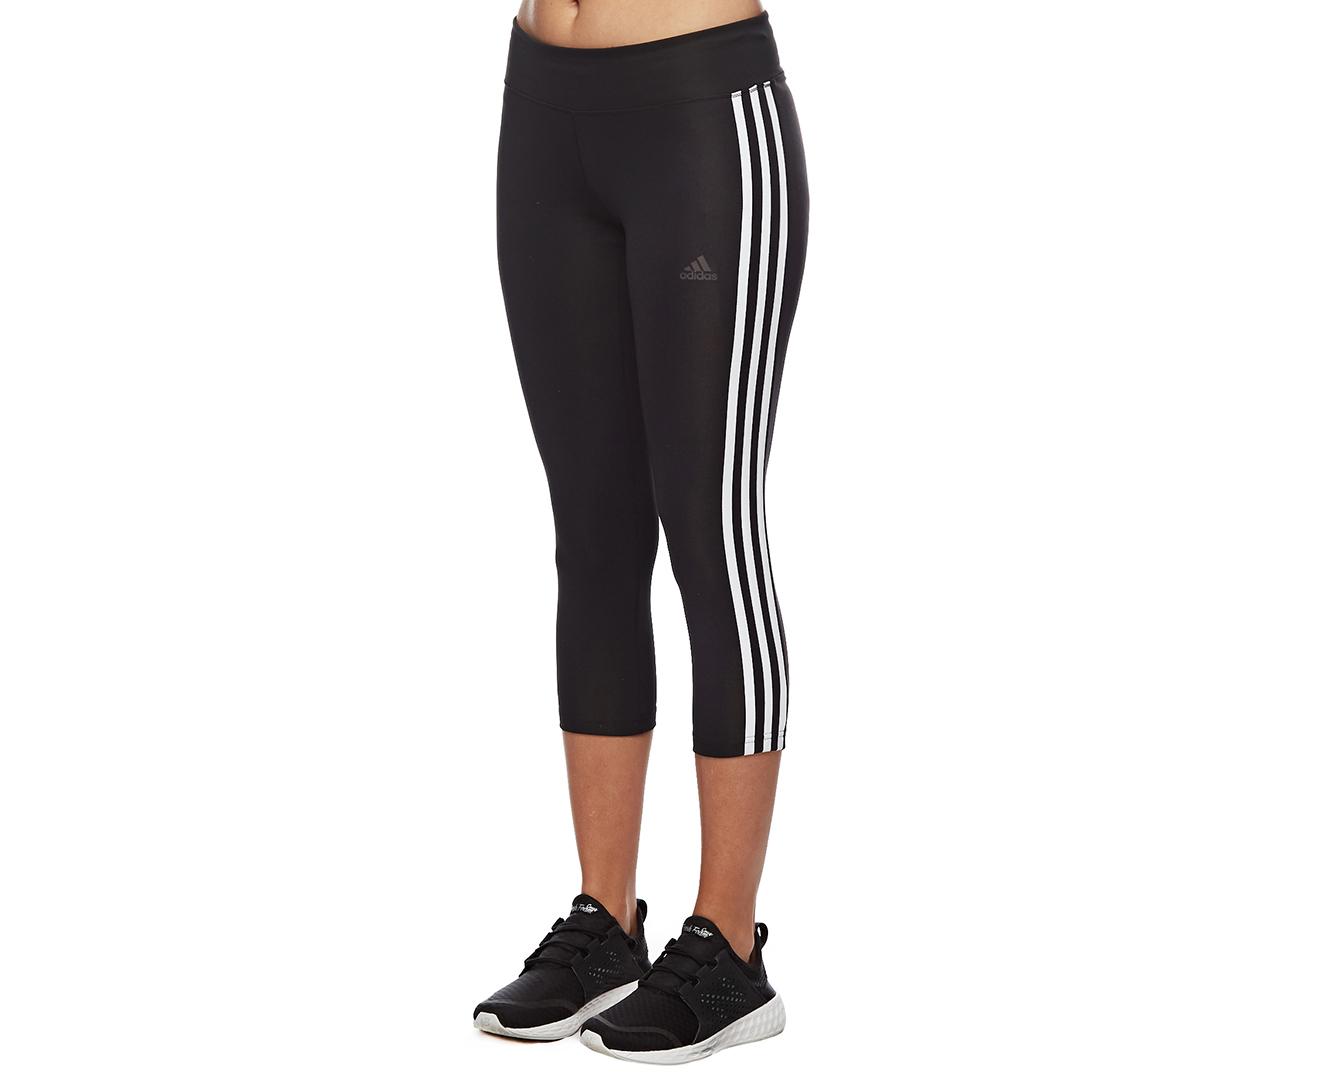 Details about Adidas Women's Designed 2 Move Climalite 3 Stripe 34 Tight BlackWhite